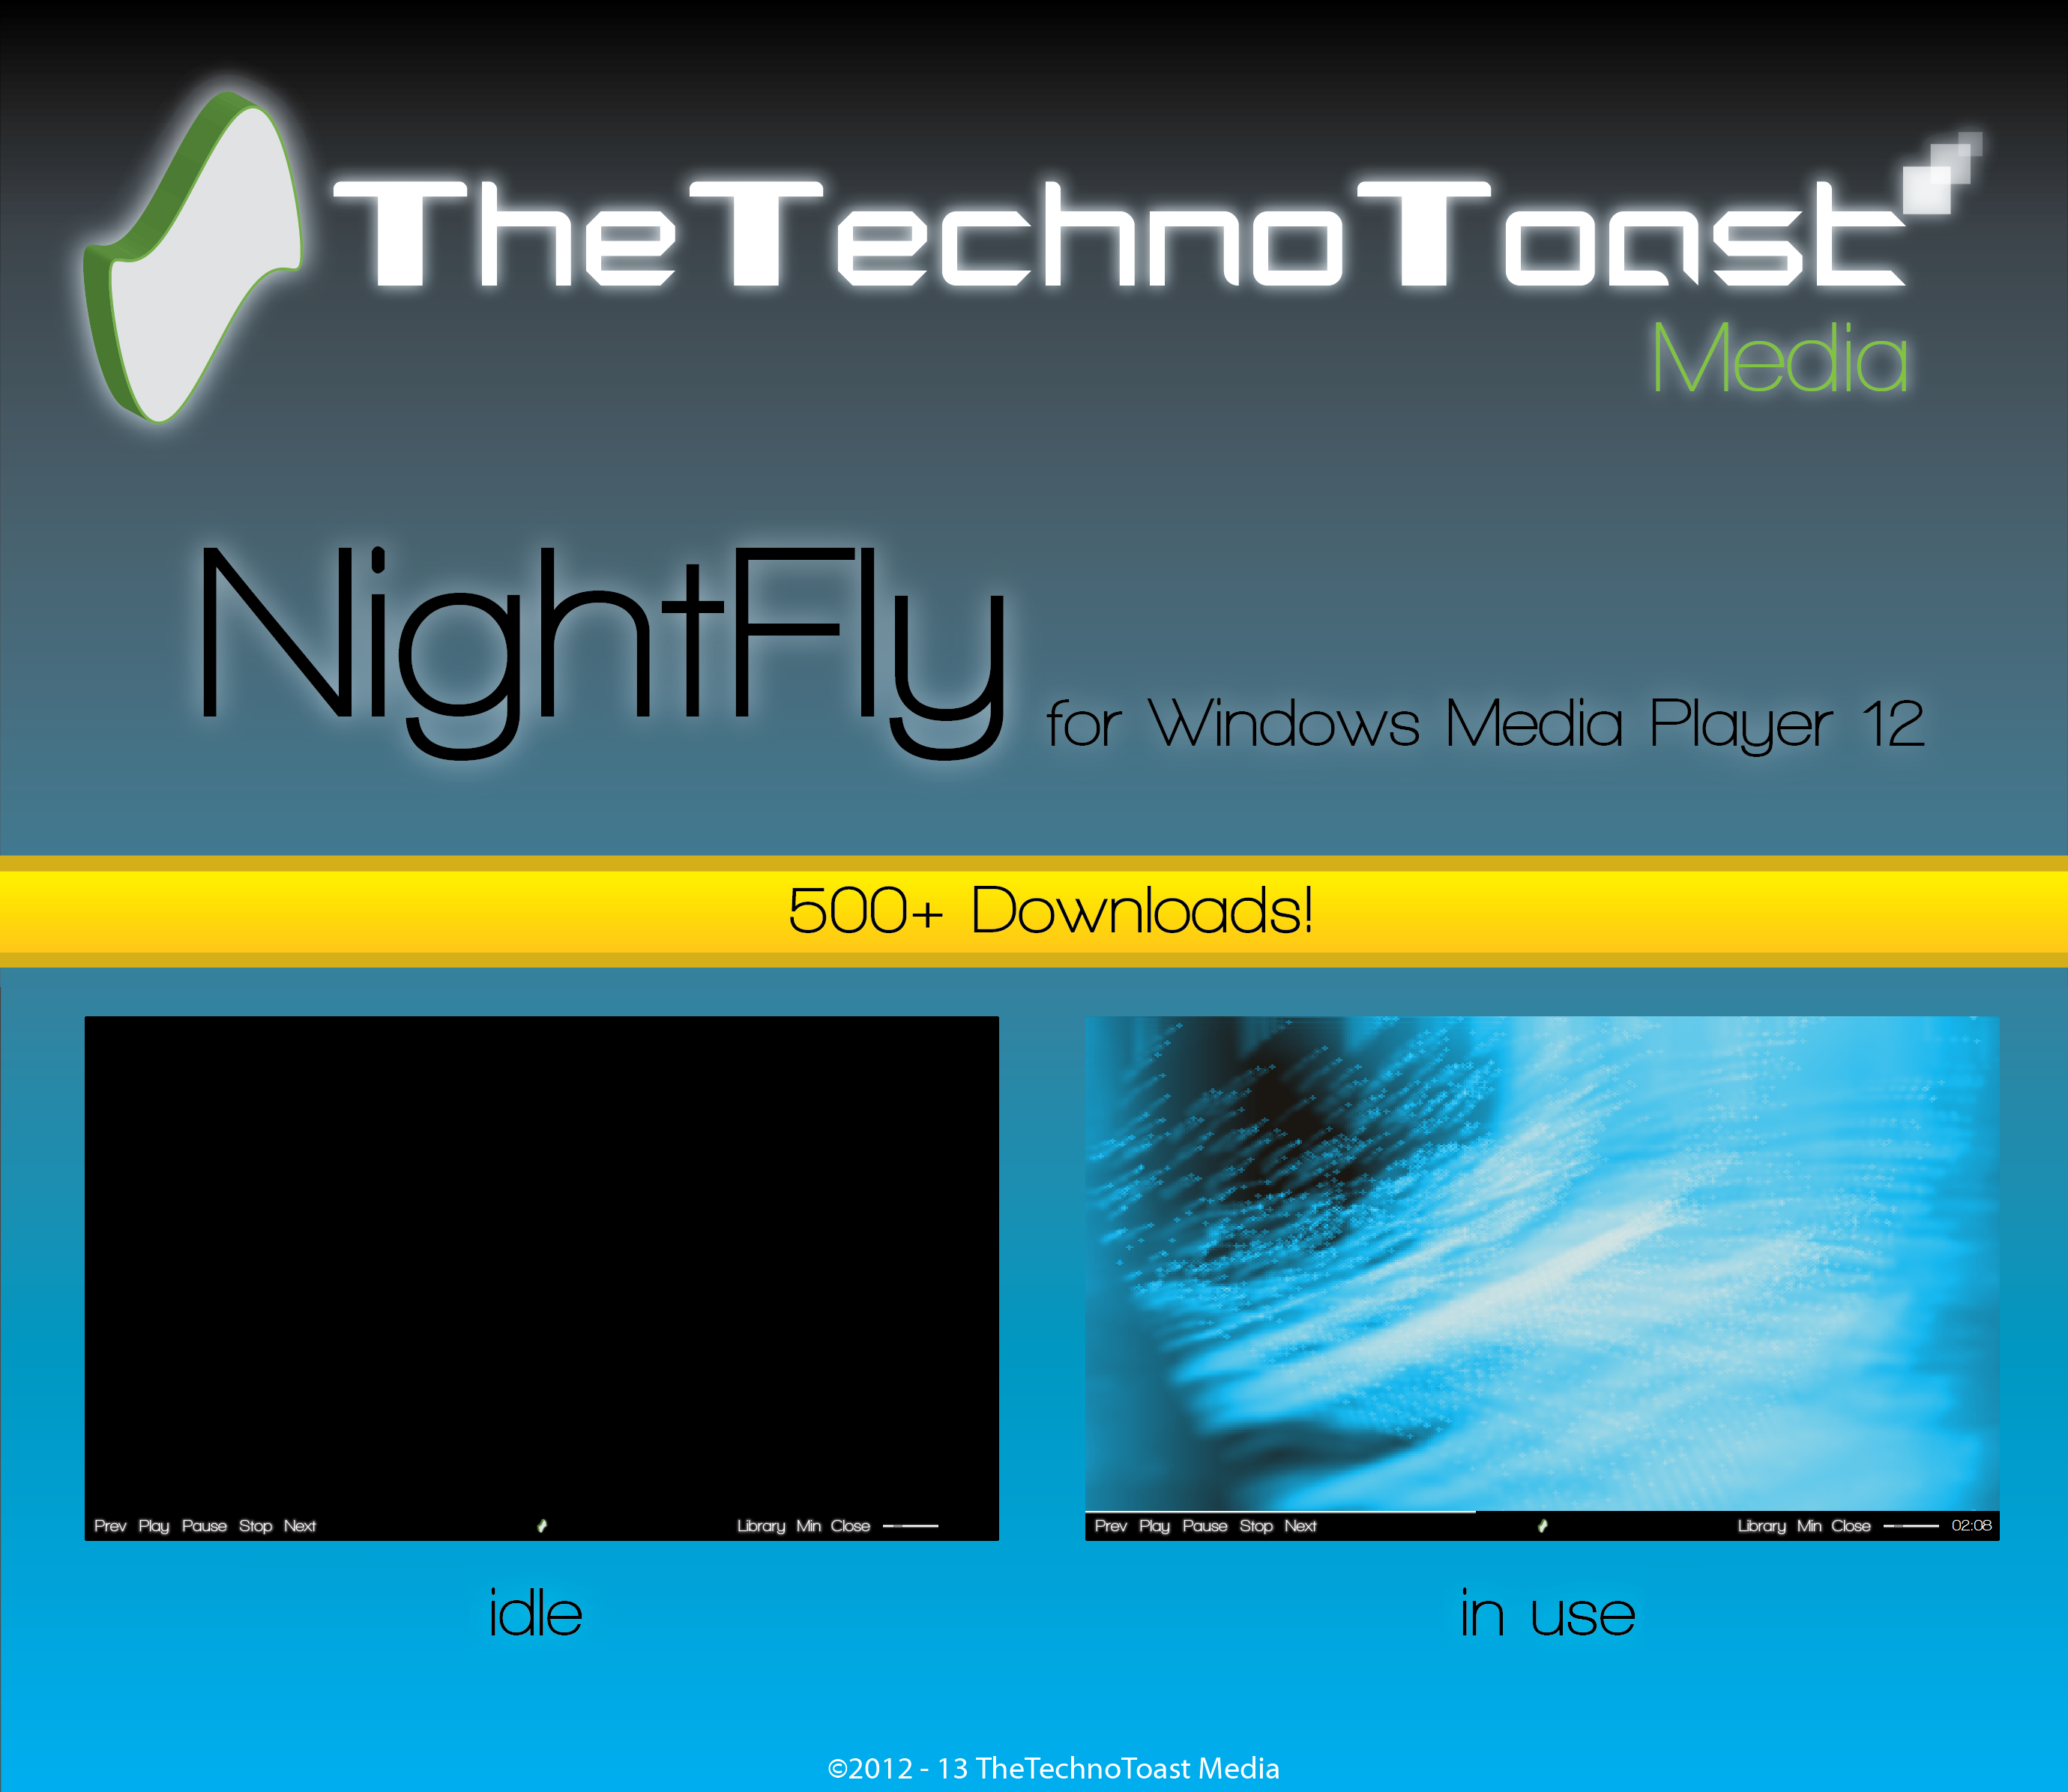 NightFly For Windows Media Player by Tecior